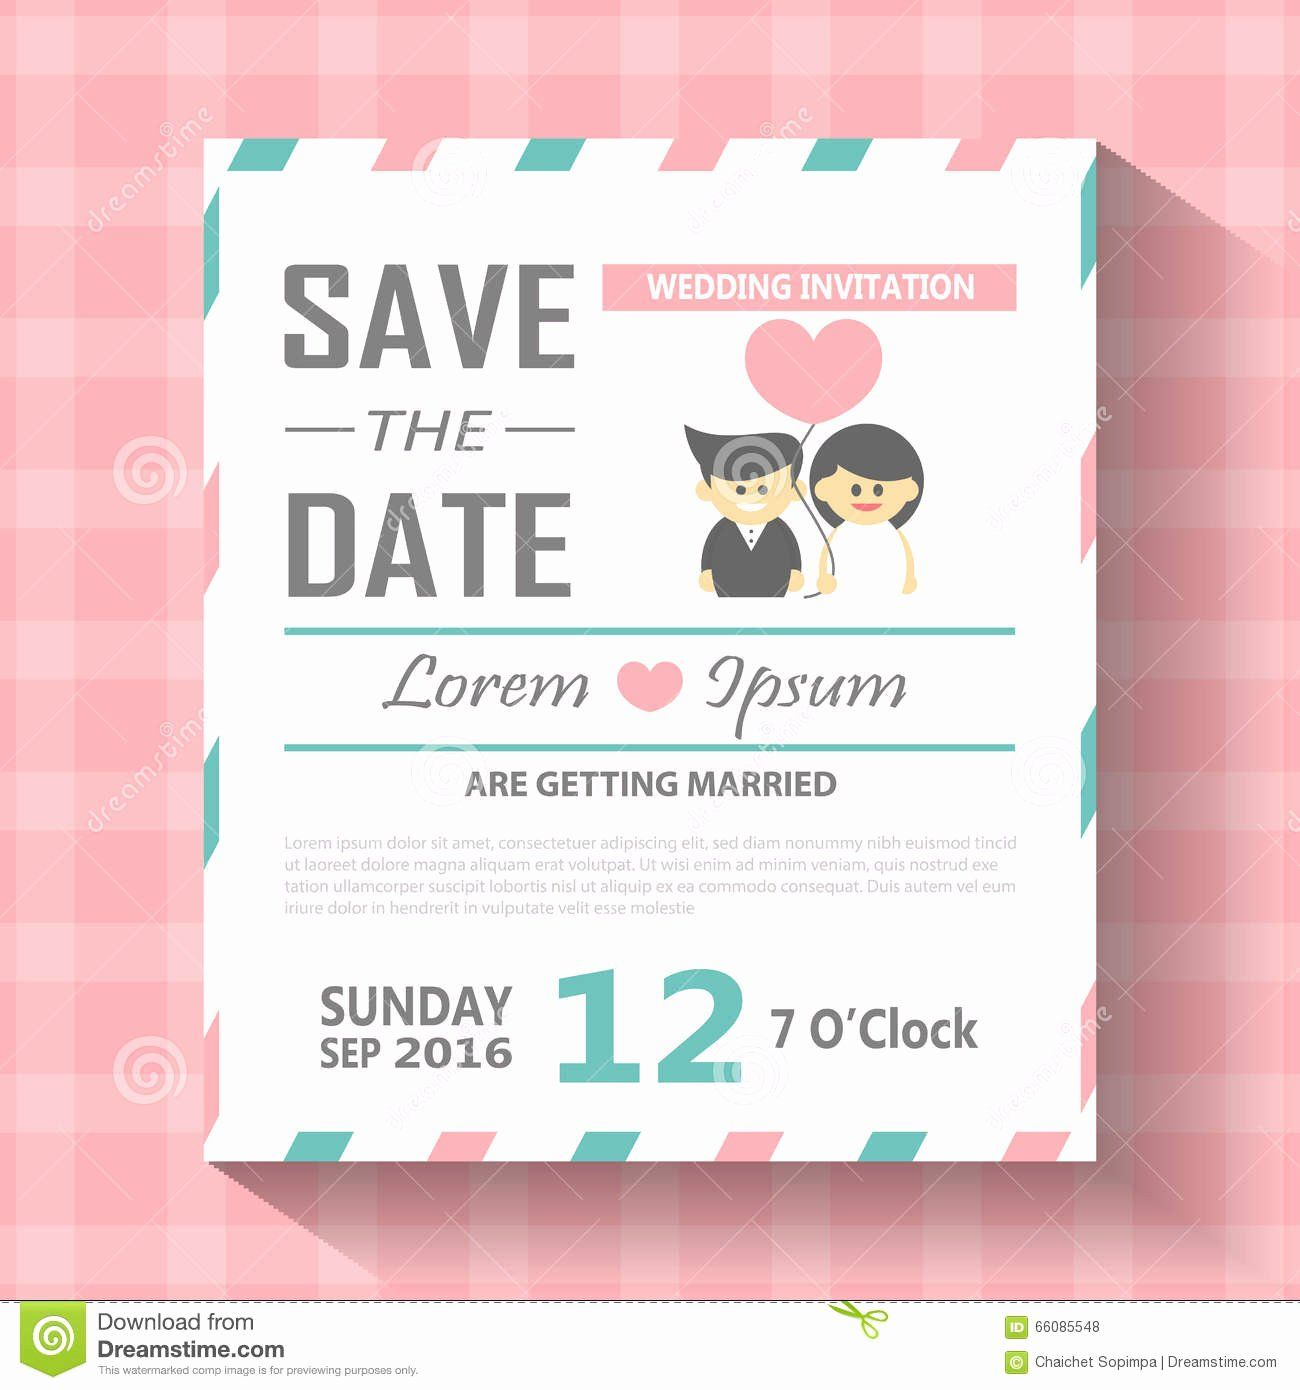 Wedding Invitation Card Template Free Lovely Wedding Invitation